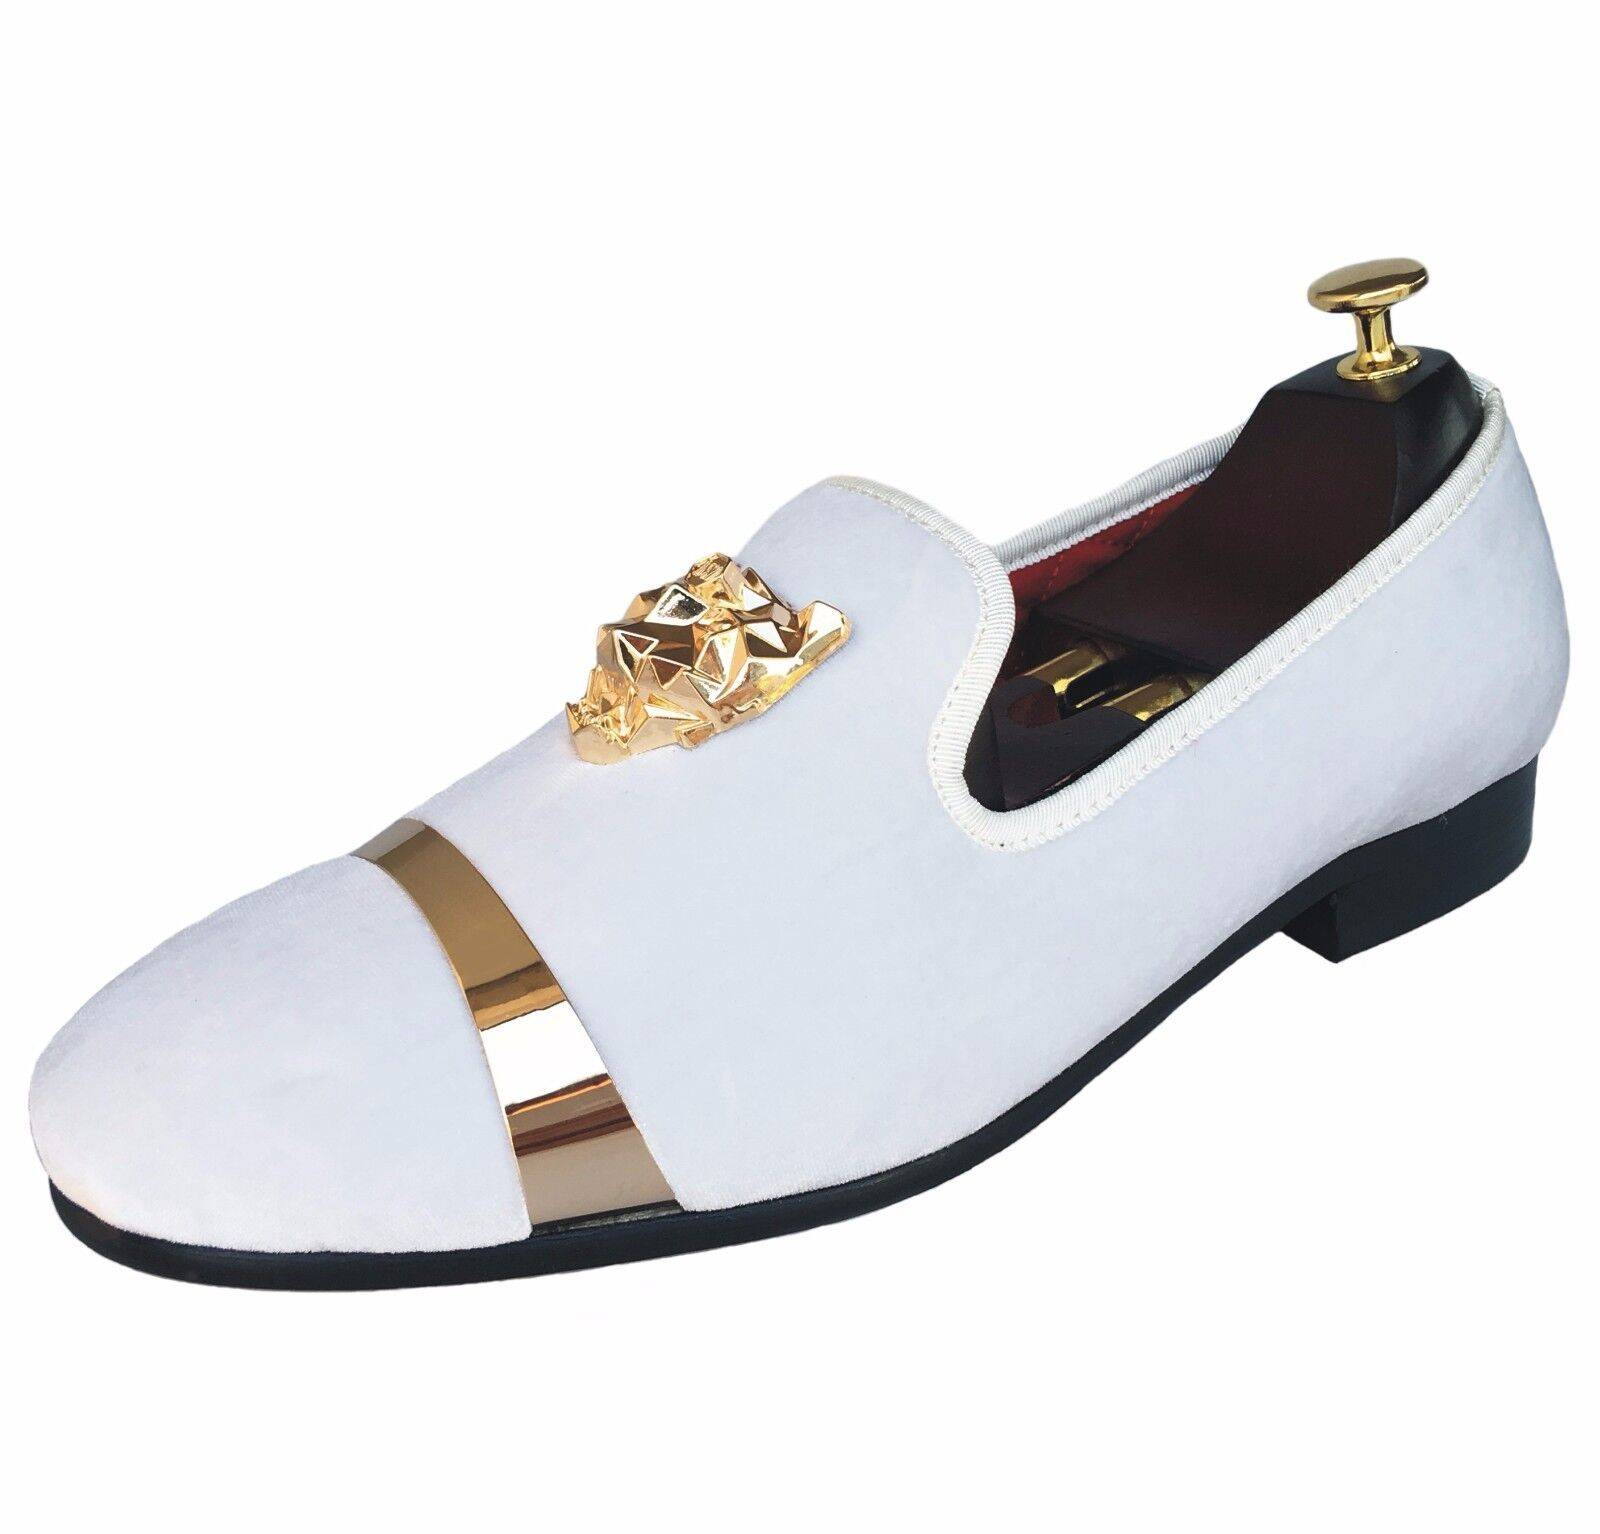 Mens Velvet Loafers Slippers Flats With Gold Buckle Slip-on Wedding ... 29402c805623